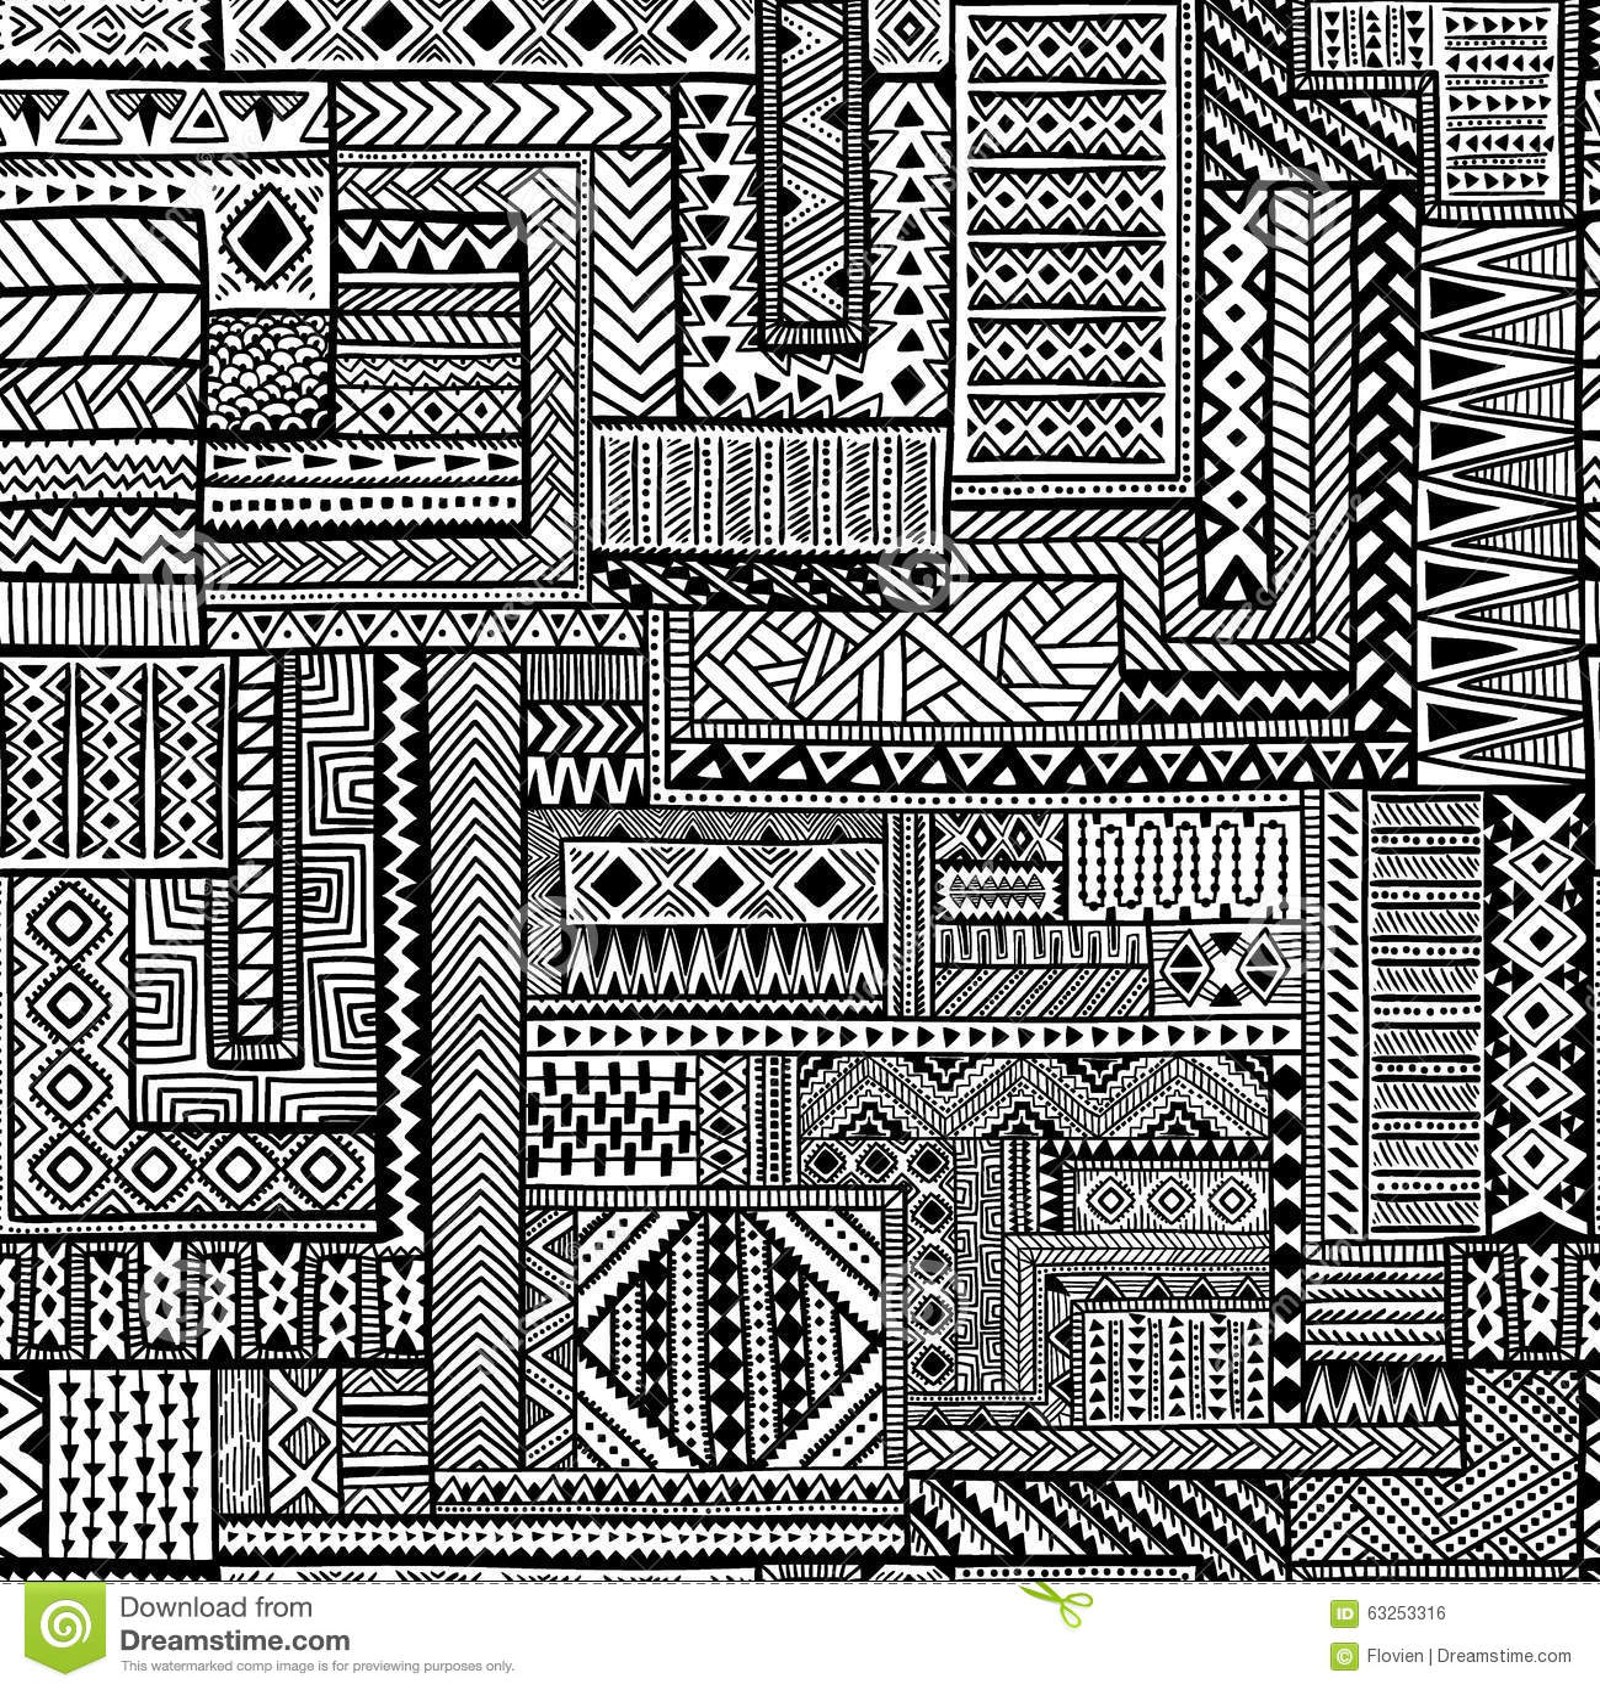 Grid 6 Zentangle Muster Zentangle Zeichnungen 4